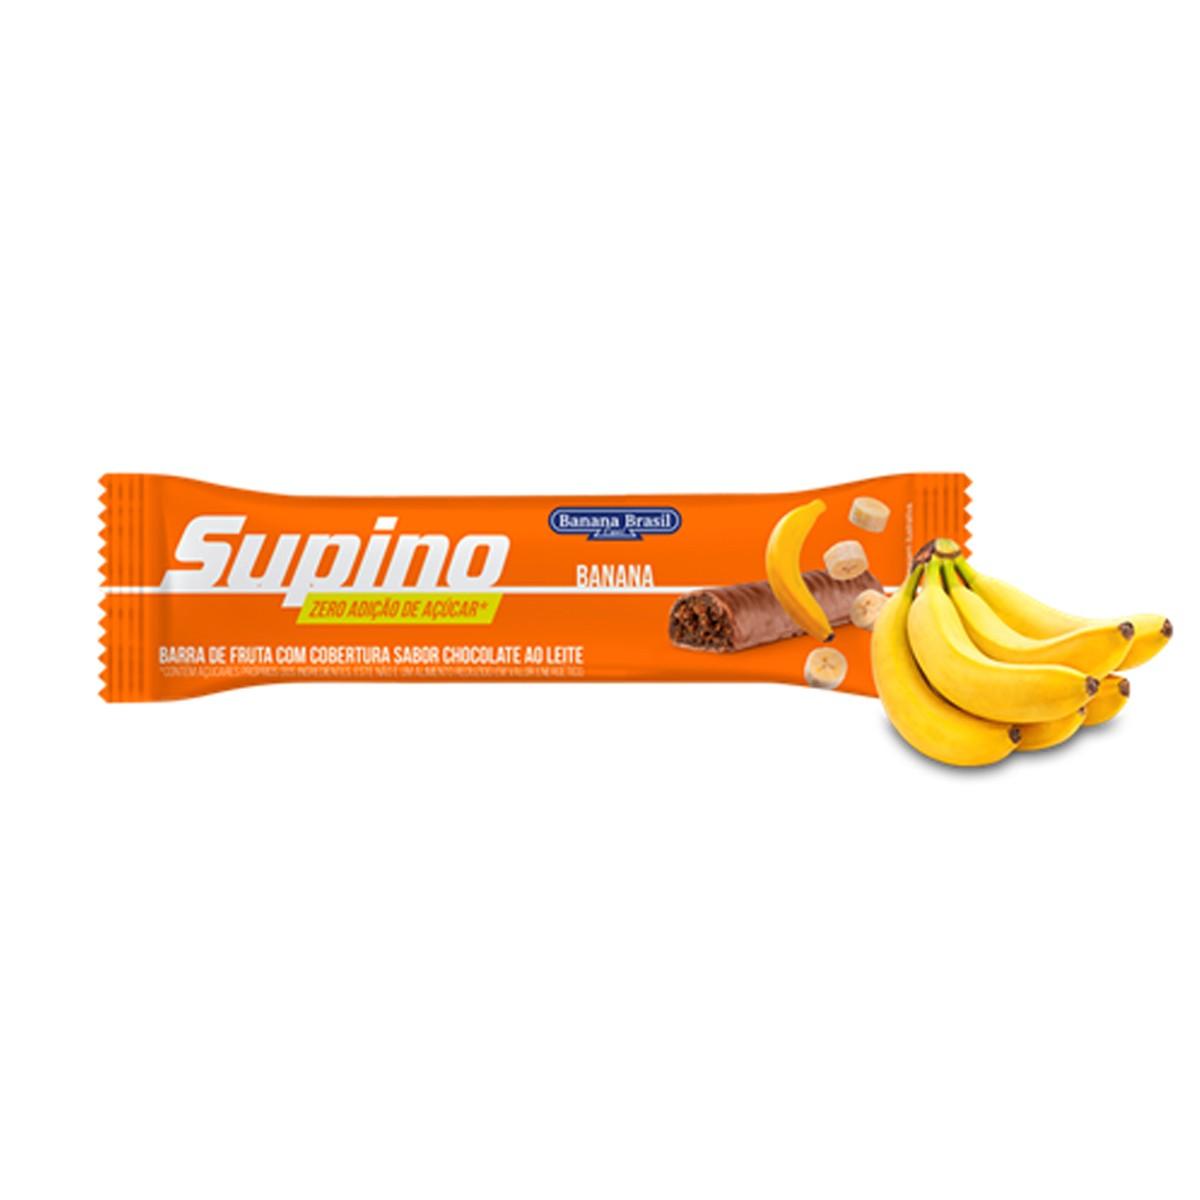 Barra de Fruta Supino Zero Banana e Chocolate 24g  - Banana Brasil